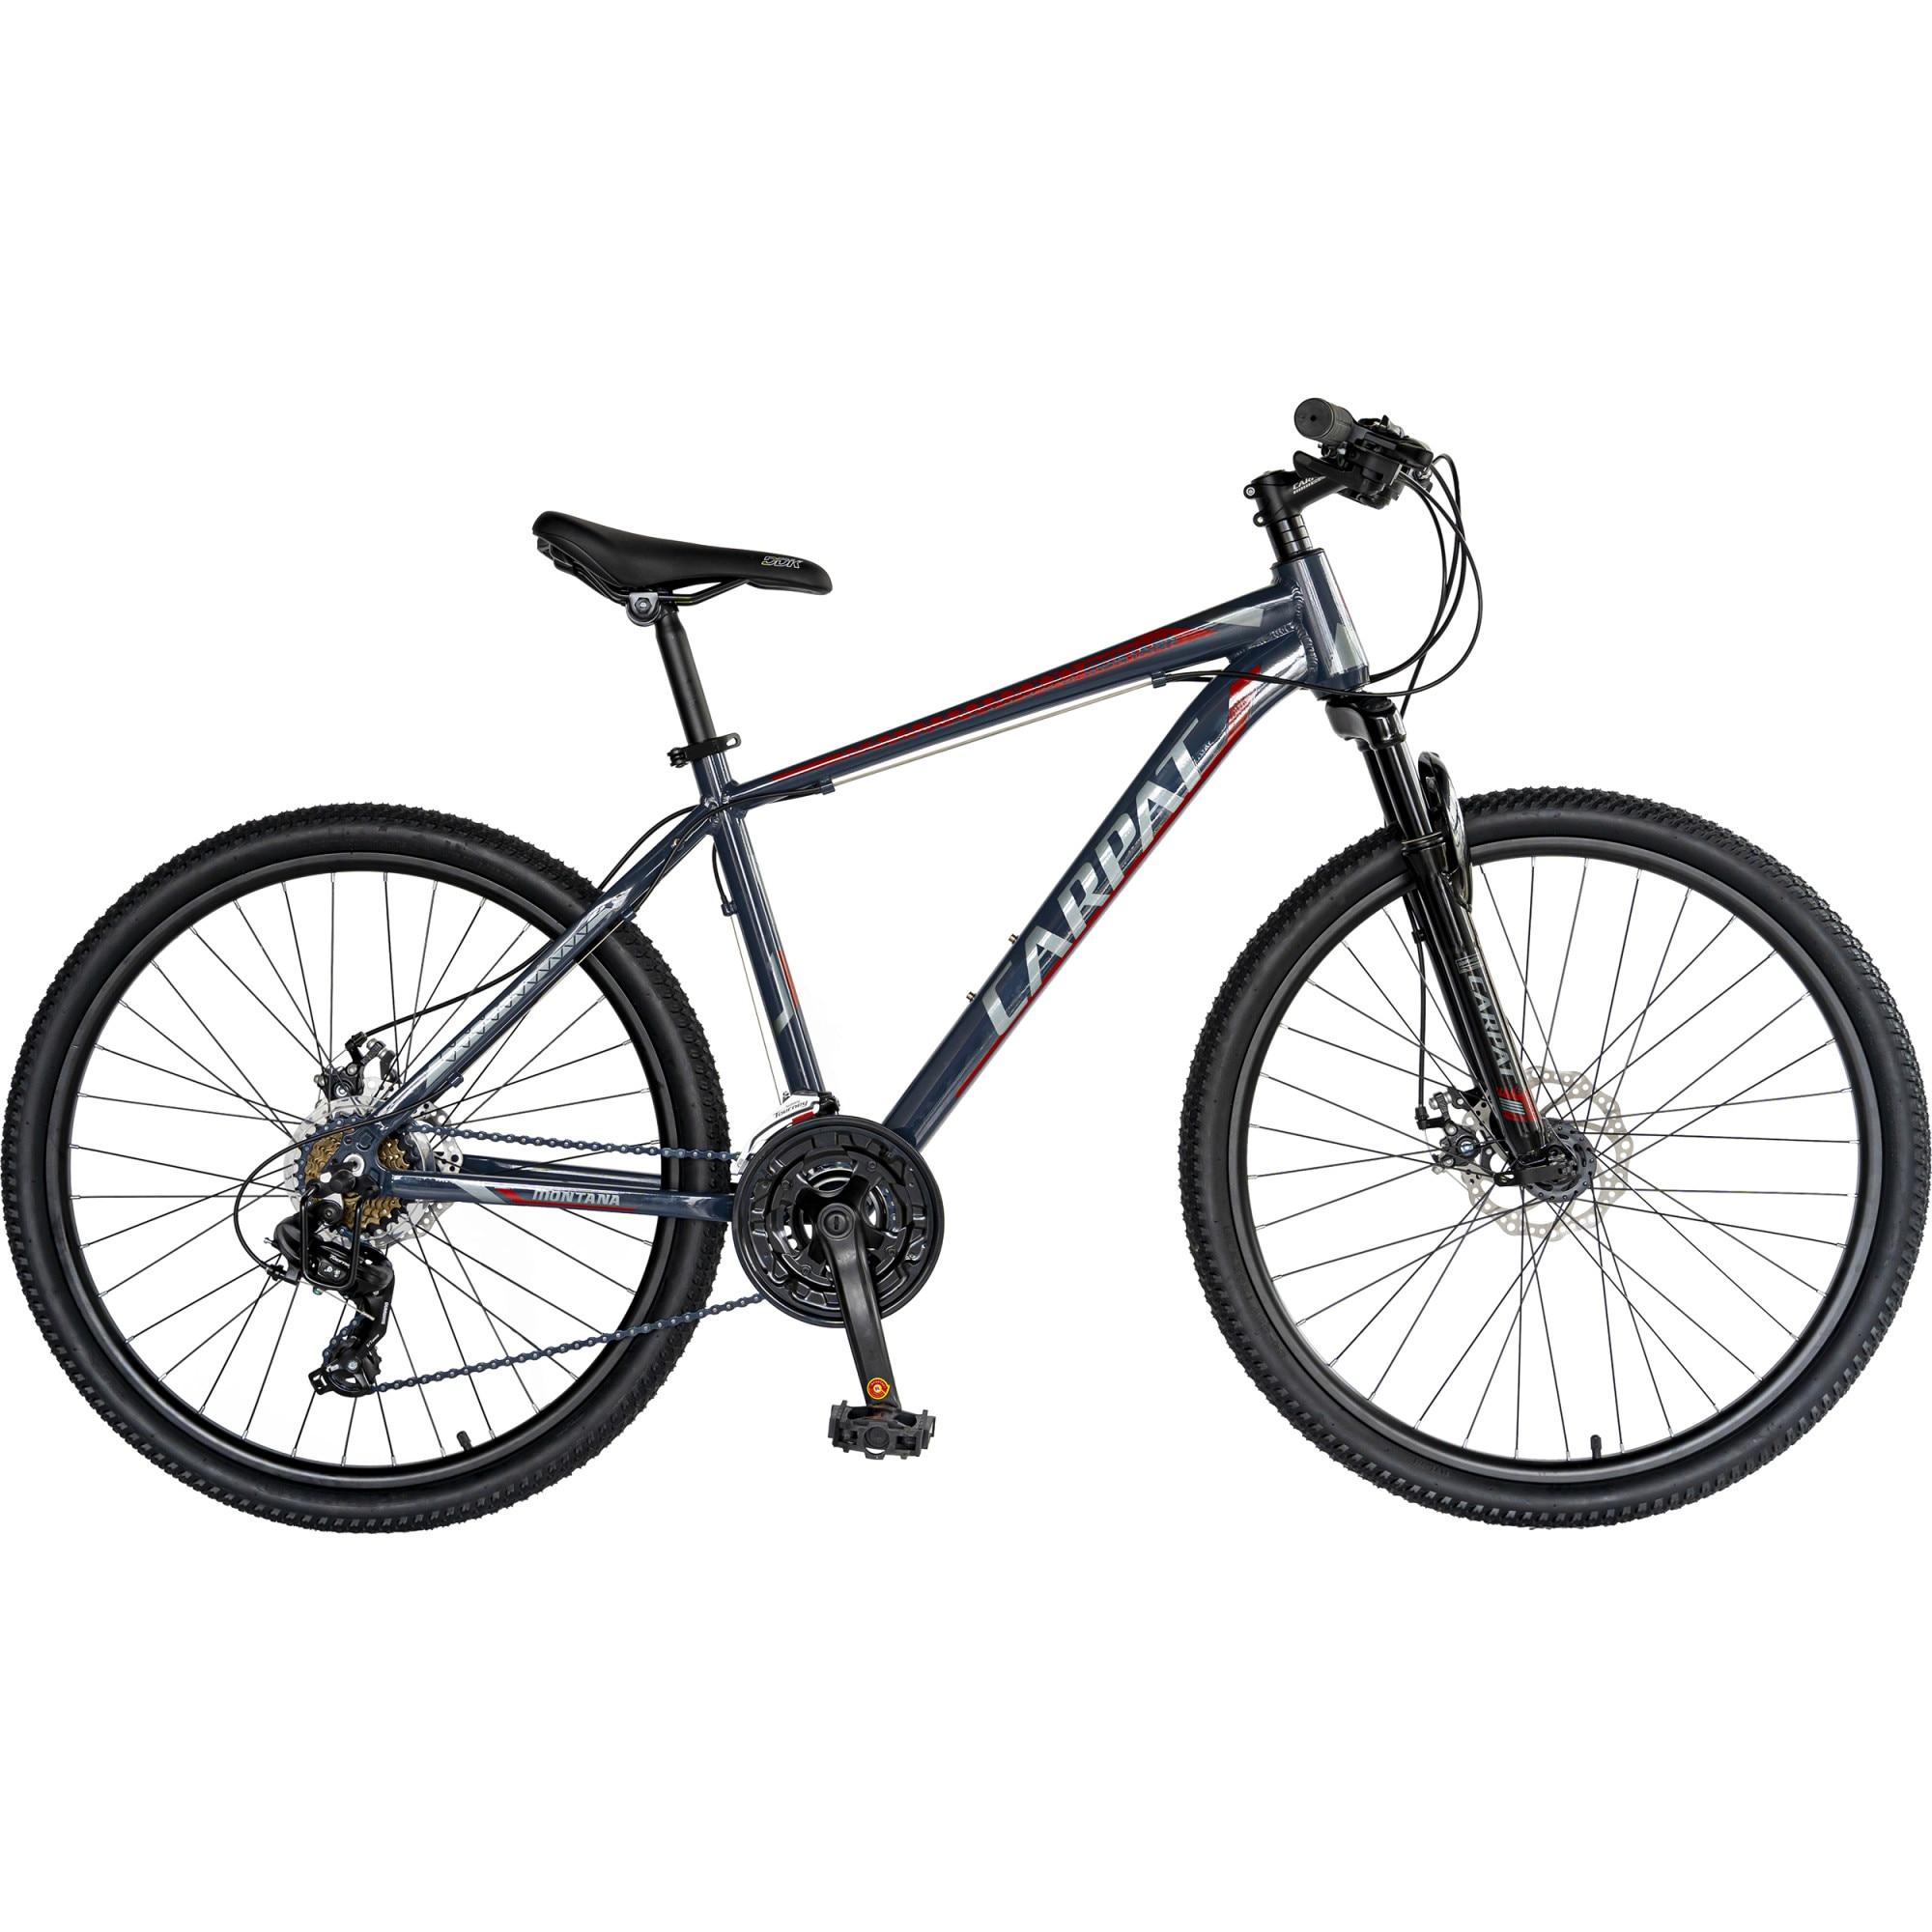 "Fotografie Bicicleta MTB 26"" Carpat C2670C, Gri/Rosu"